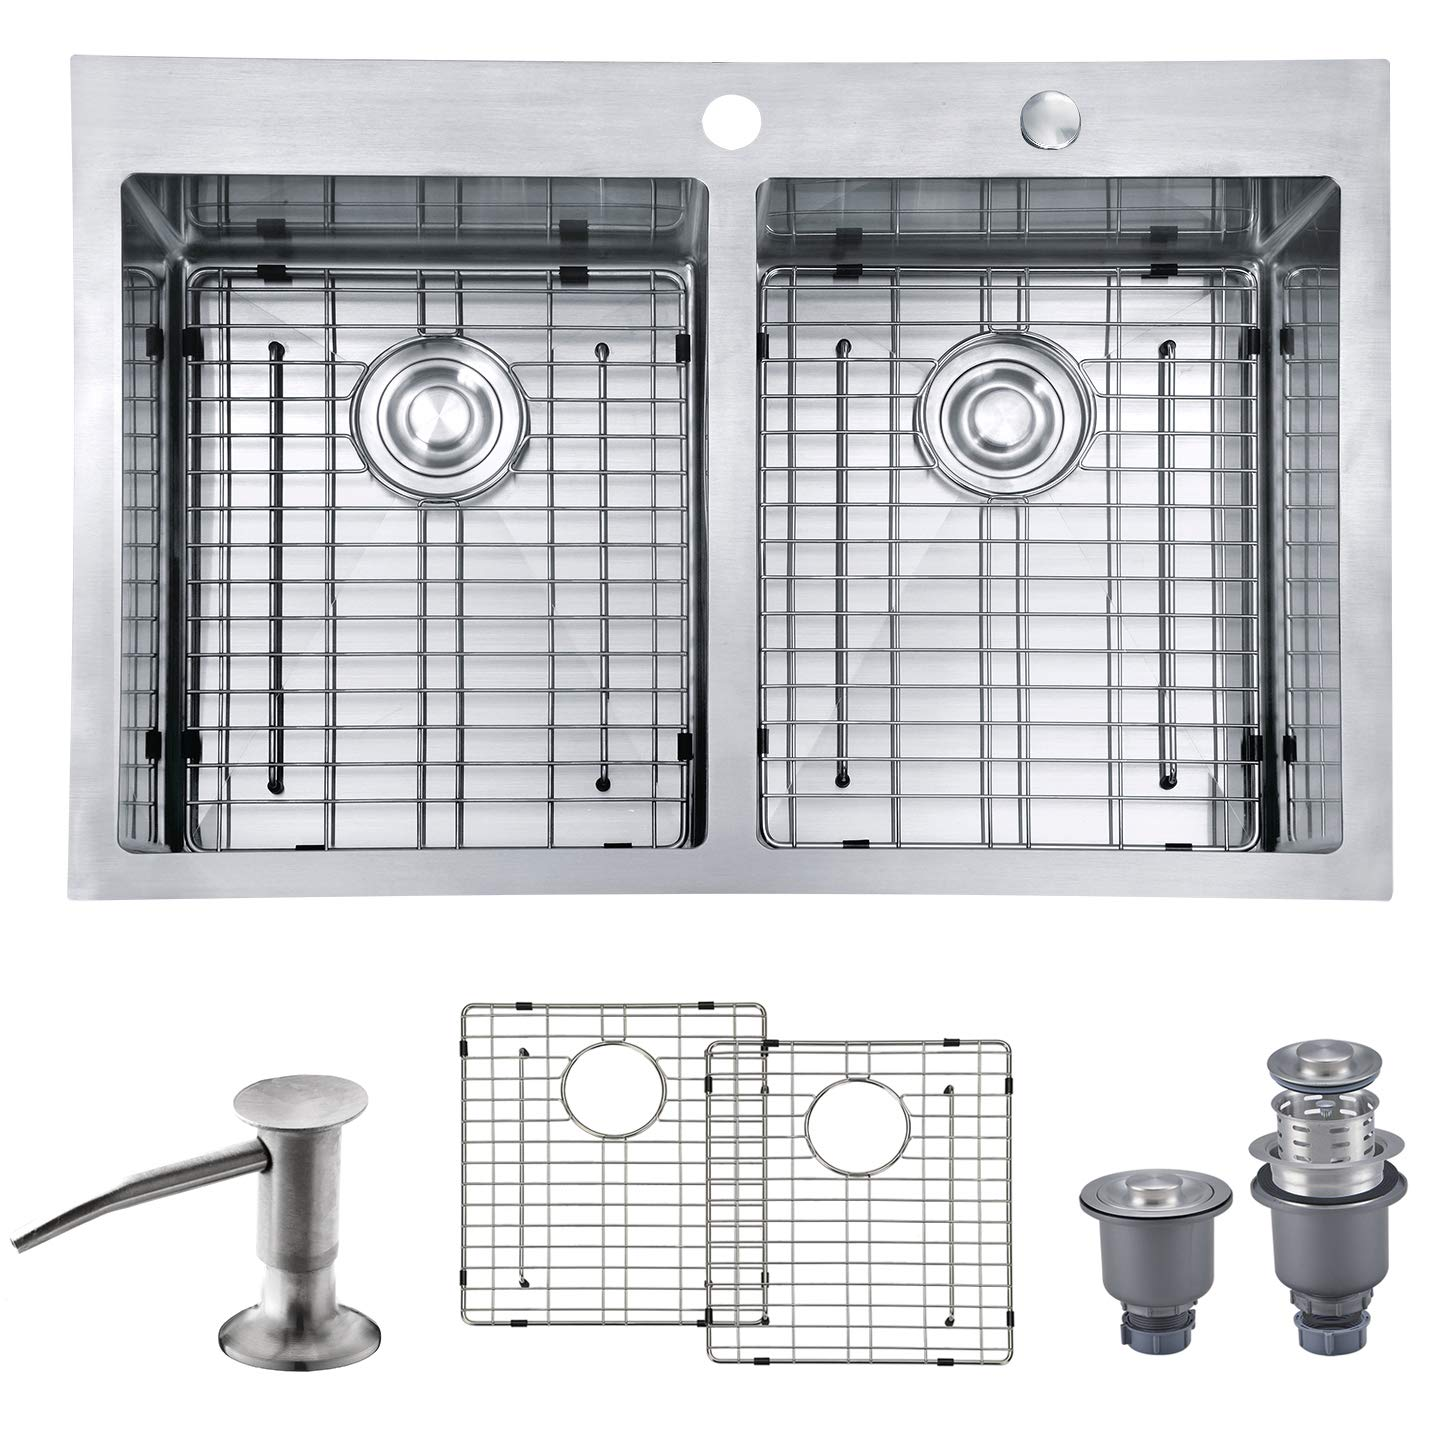 "MOWA HTD33DE Upgraded Perfect Drainage Handmade 33"" 16 Gauge Stainless Steel Topmount 50/50 Double Bowl Kitchen Sink, Deep Commercial Basin Sink w/Basket Strainer, Sink Grids & Bonus Soap Dispenser"